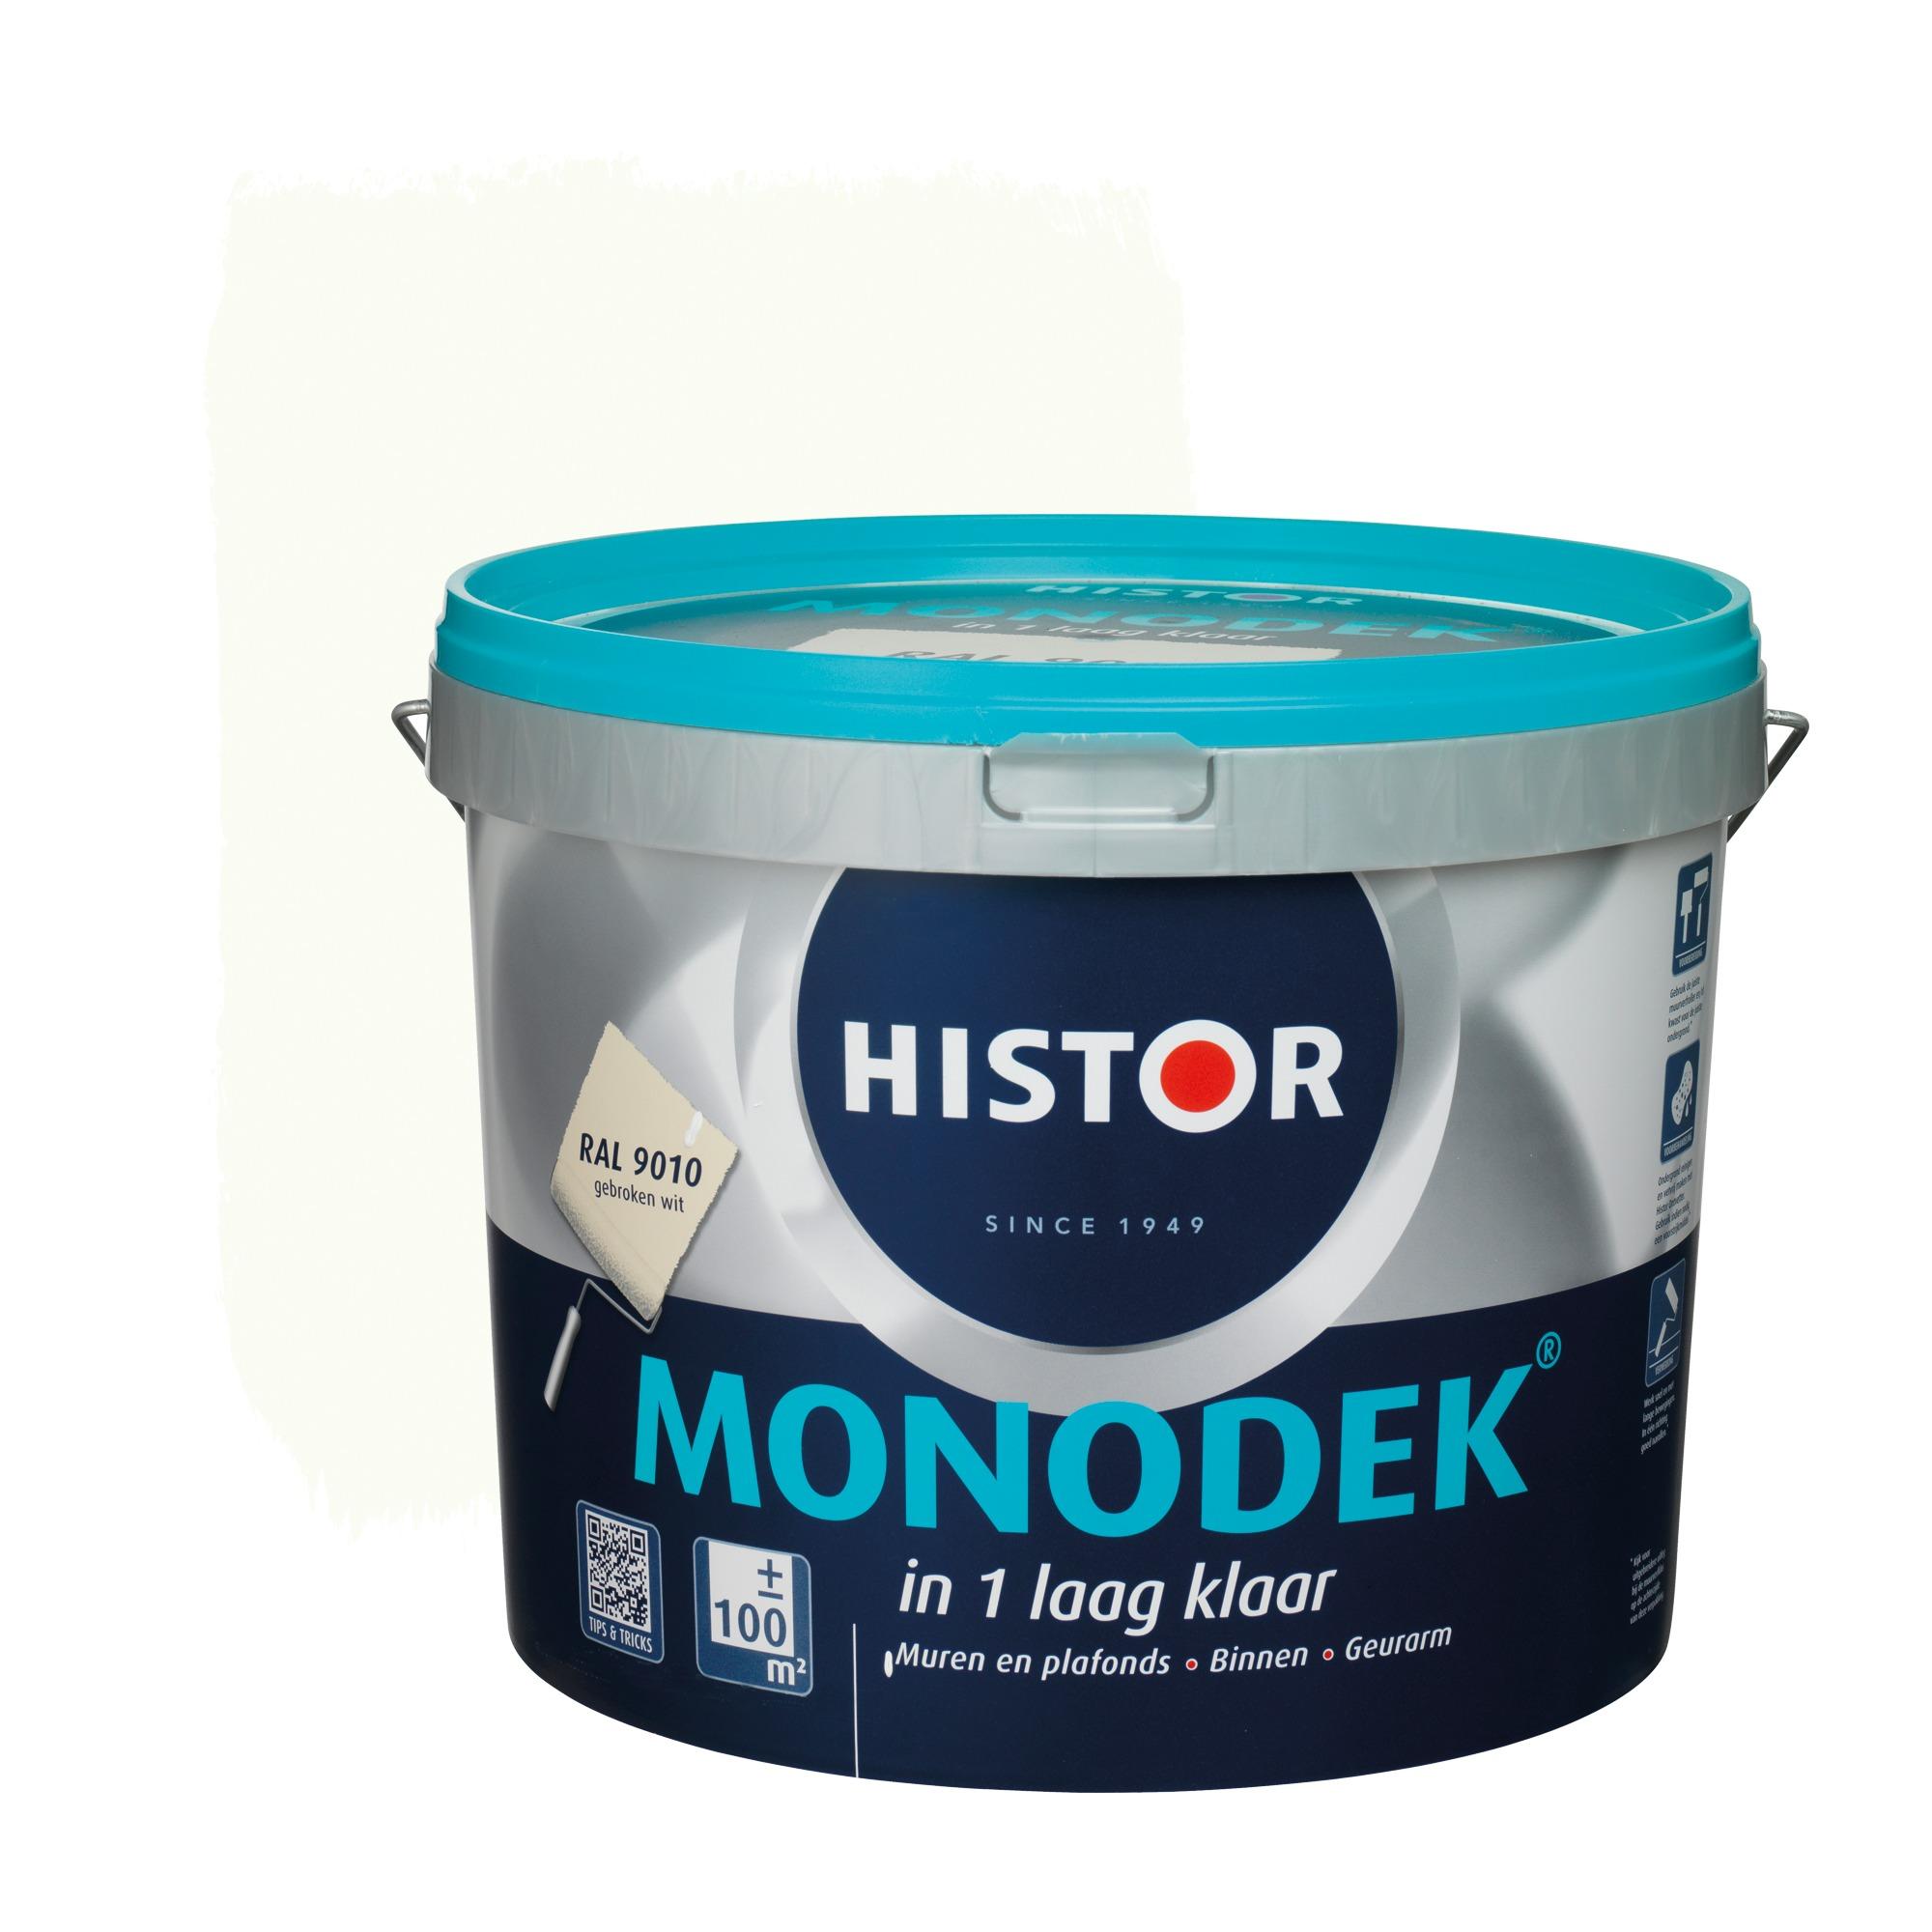 Histor Monodek Muurverf 10 liter